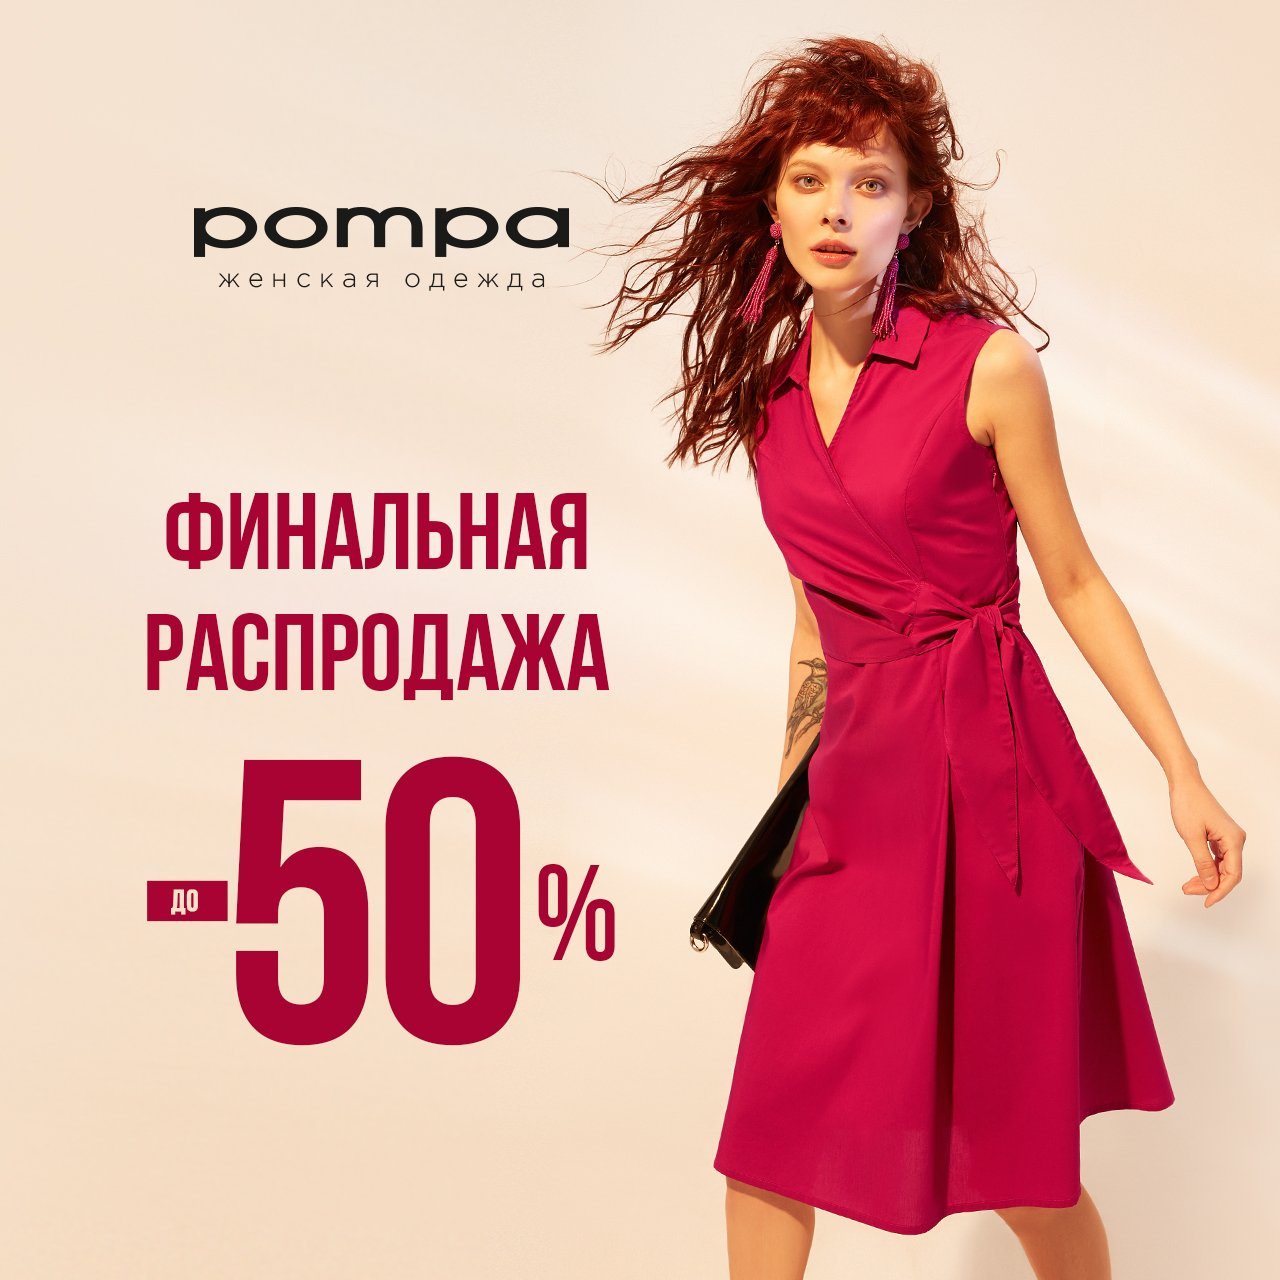 Pompa распродажа -50